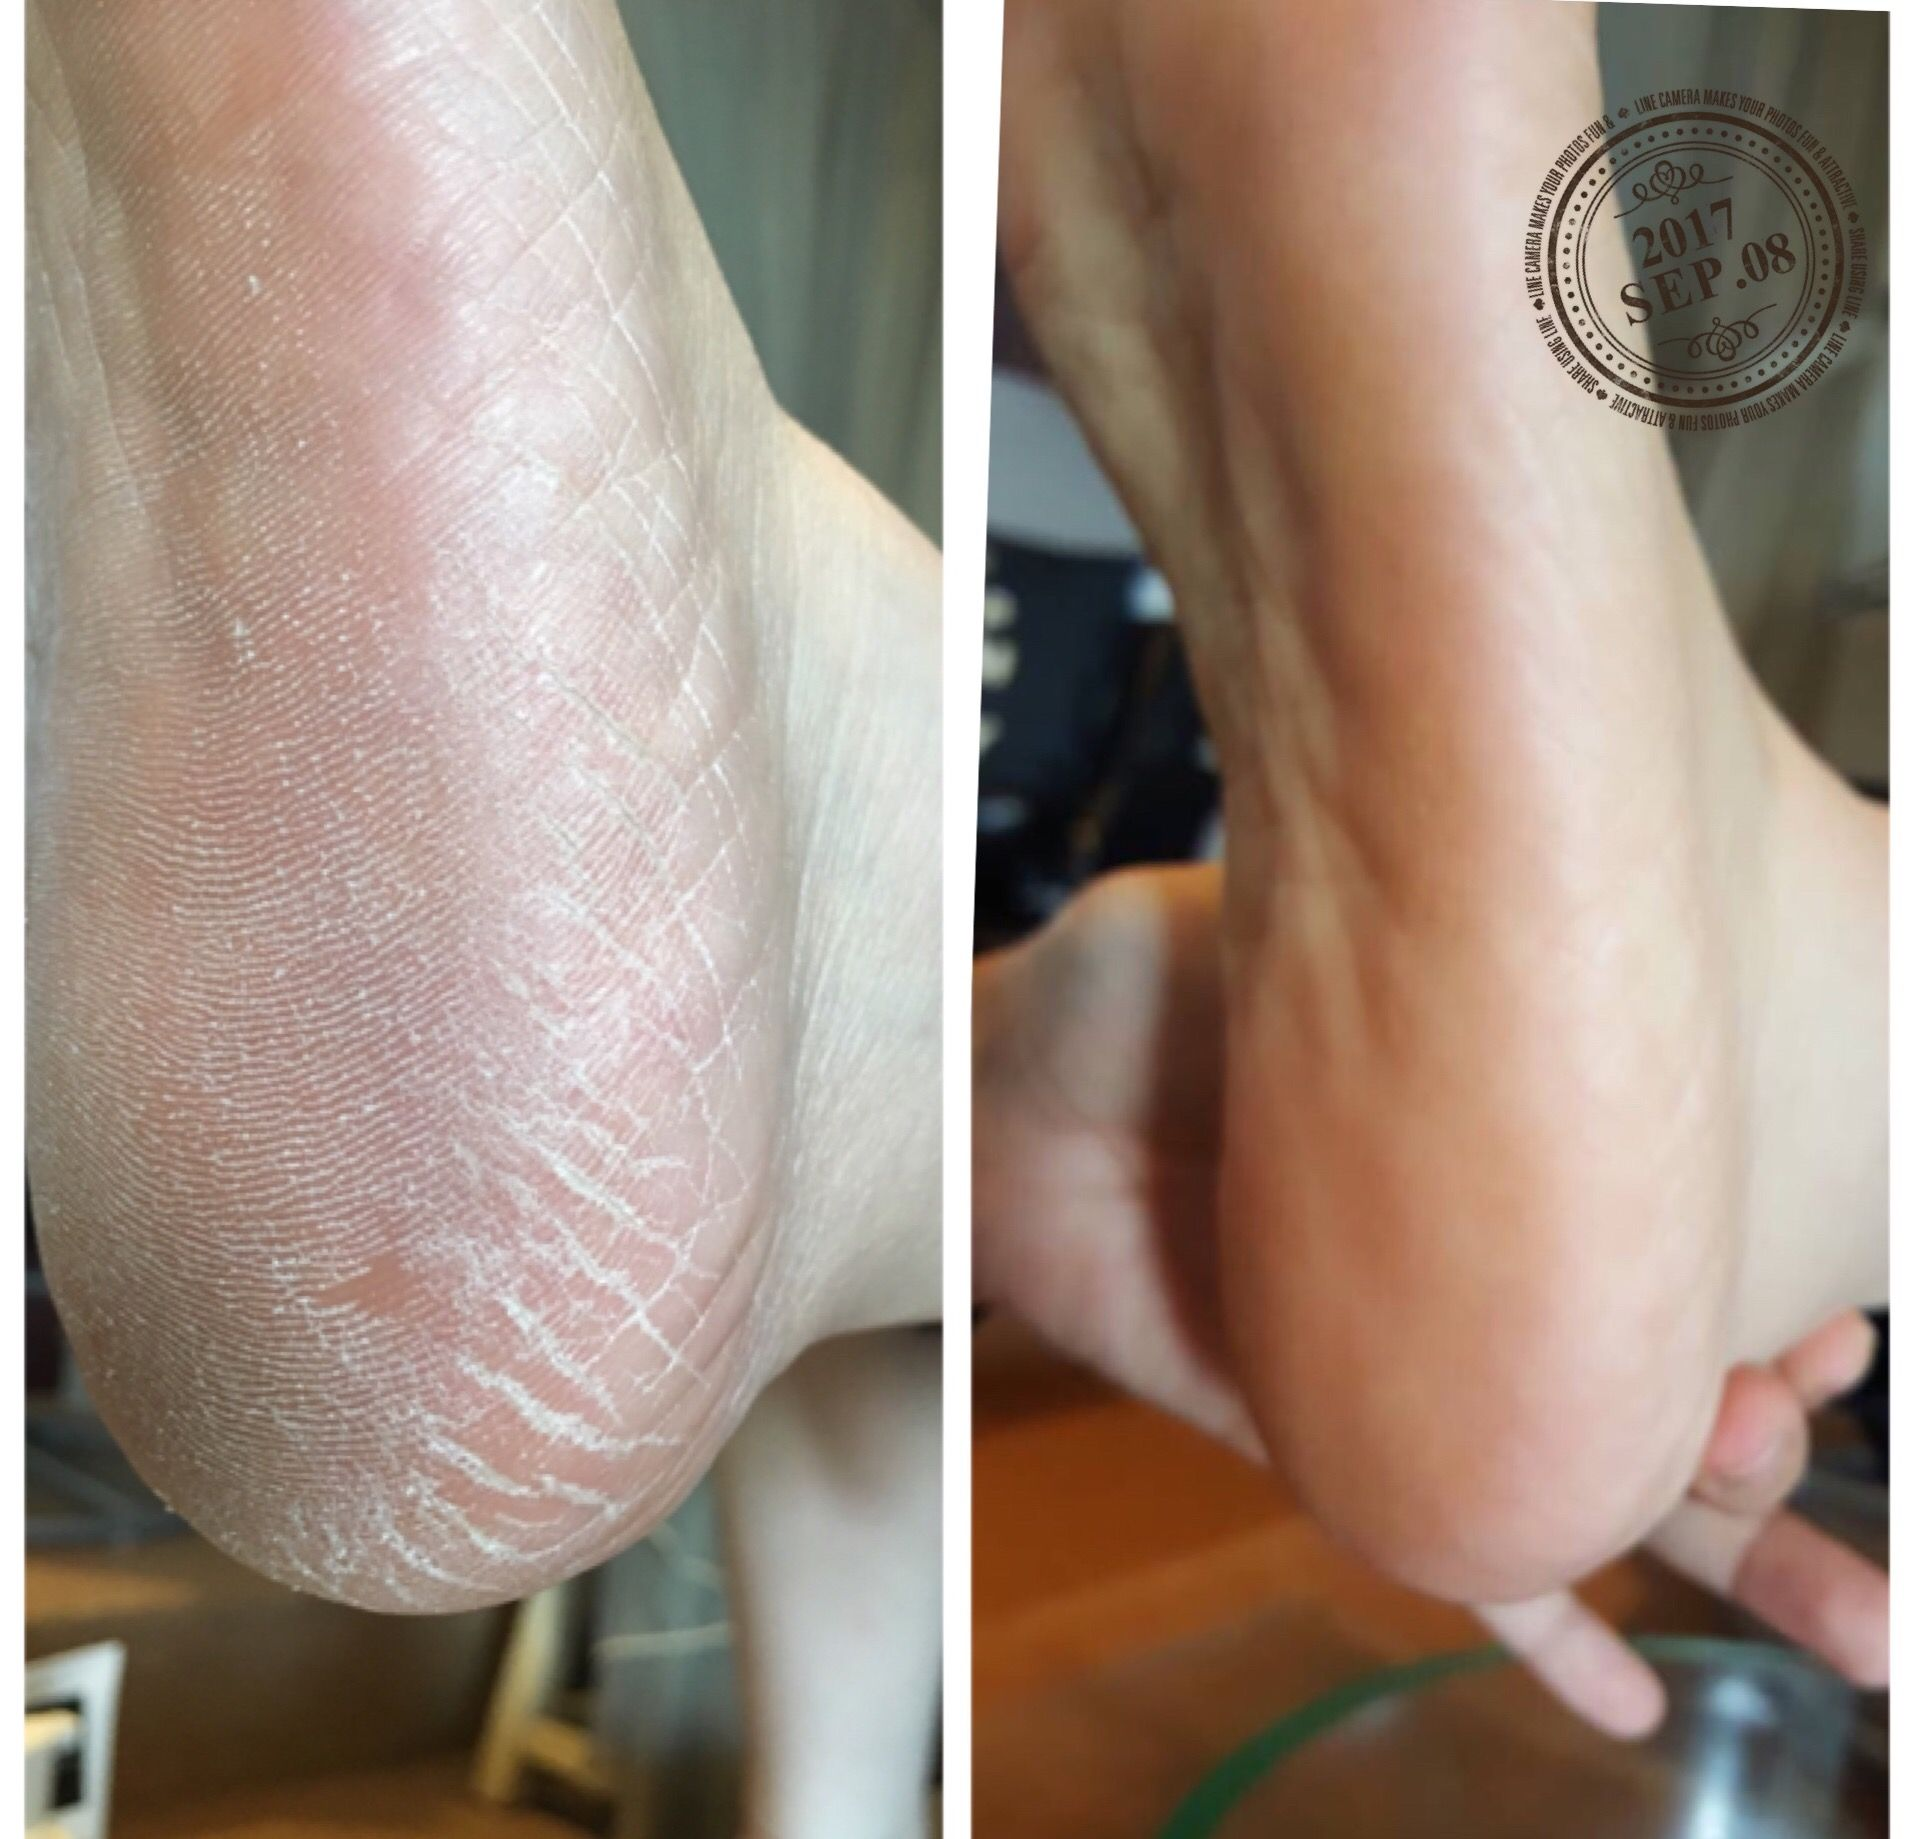 crack heel# callus remove# heel crack# dry skin# dead skin ...